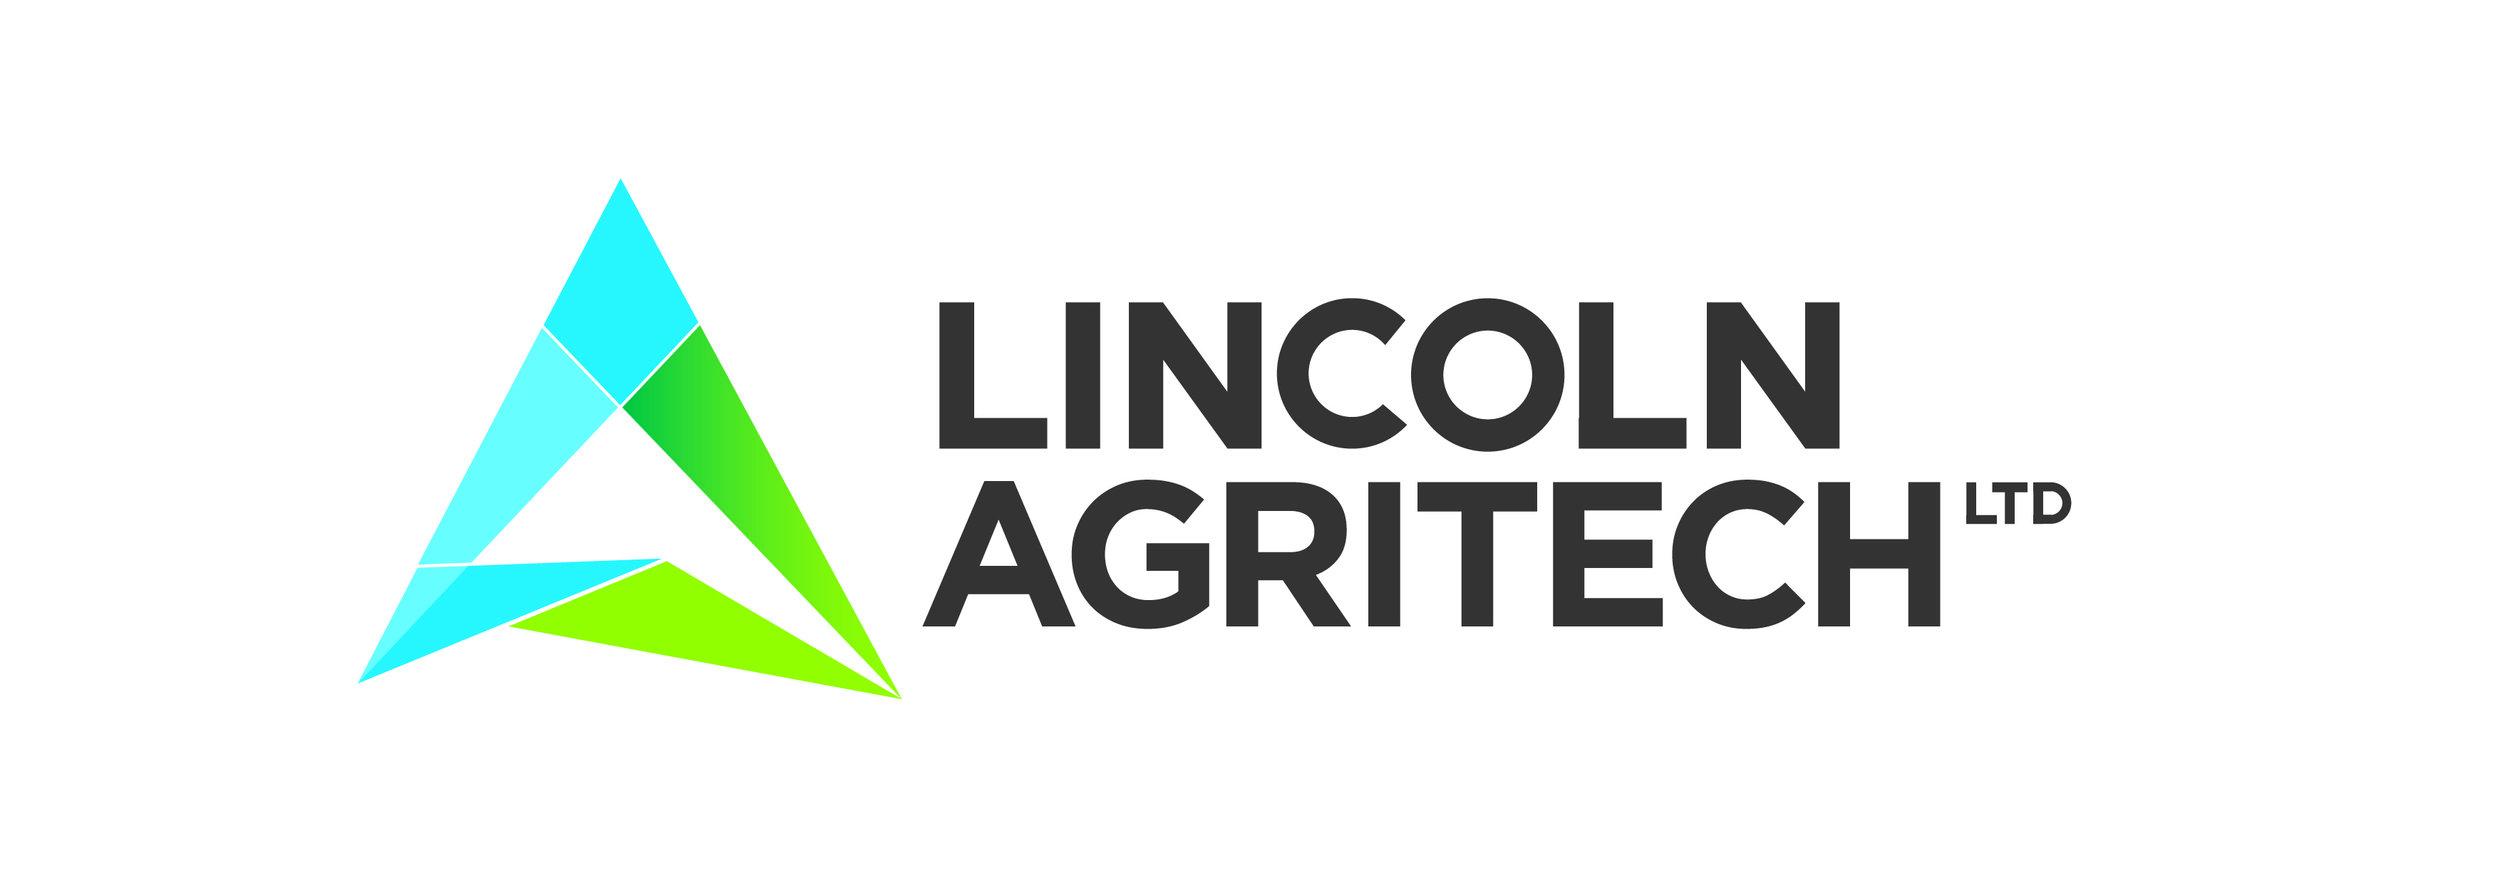 Lincoln_Agritech.JPG